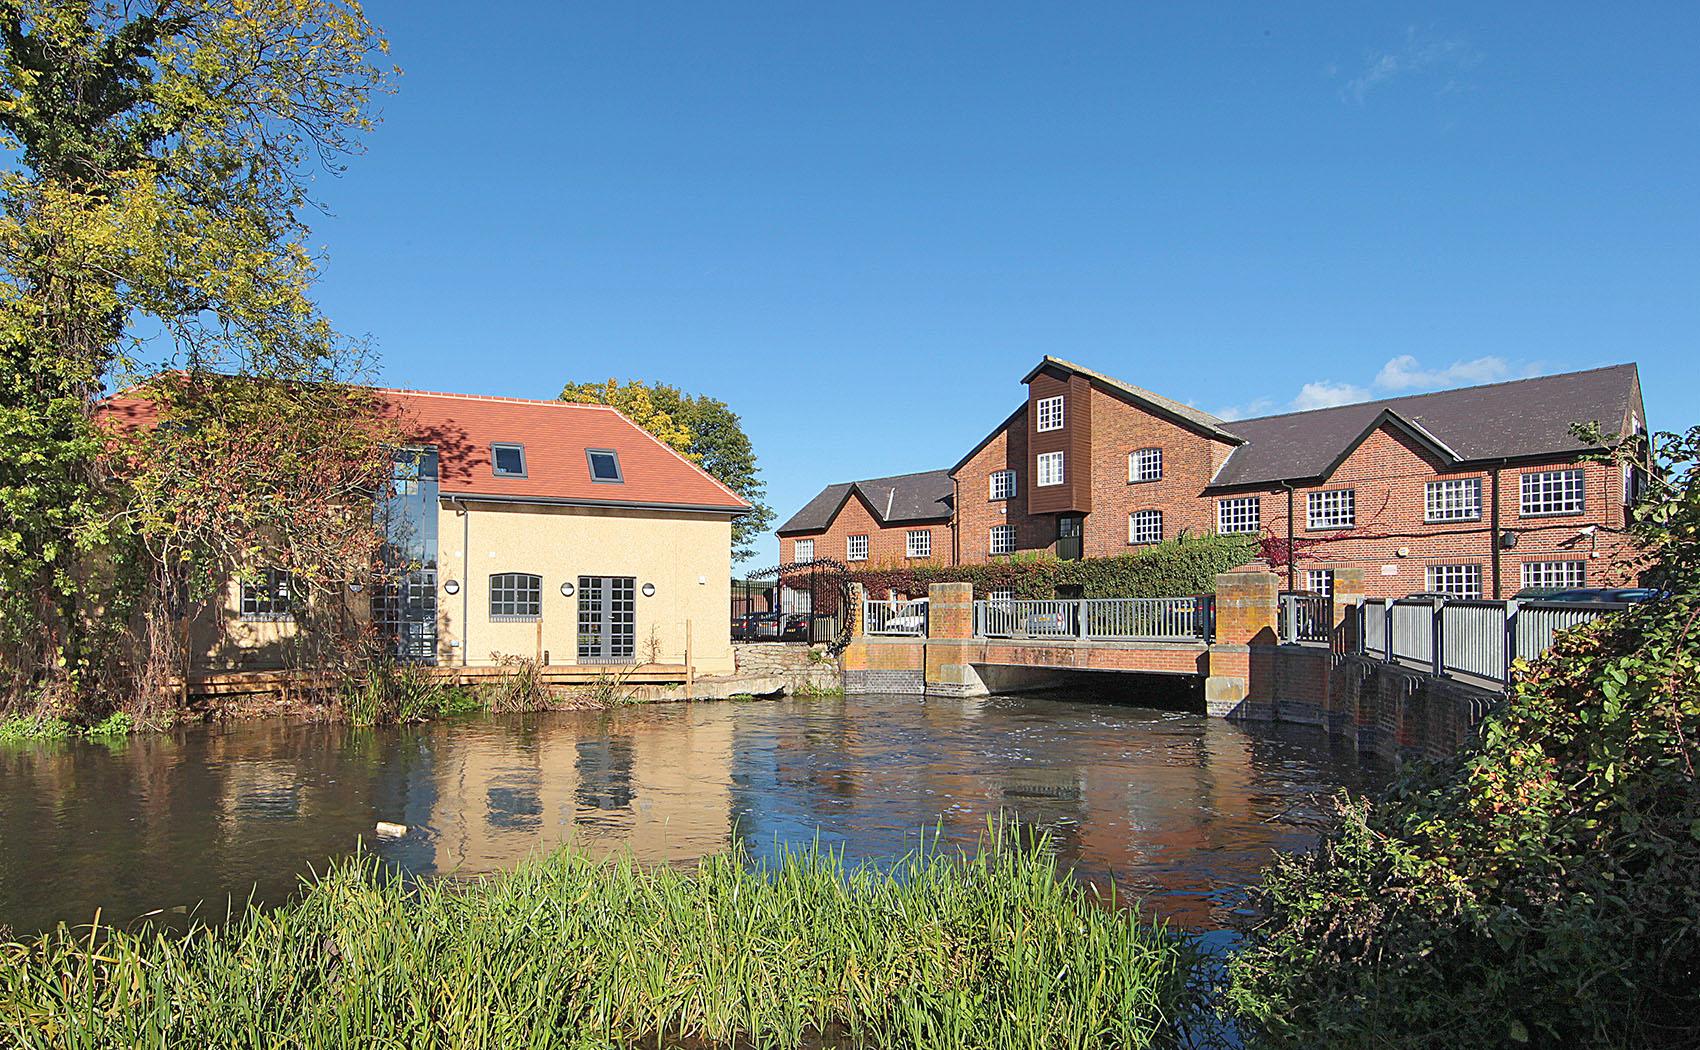 The Mill, Horton Road, Stanwell Moor, Heathrow, TW19 6BJ